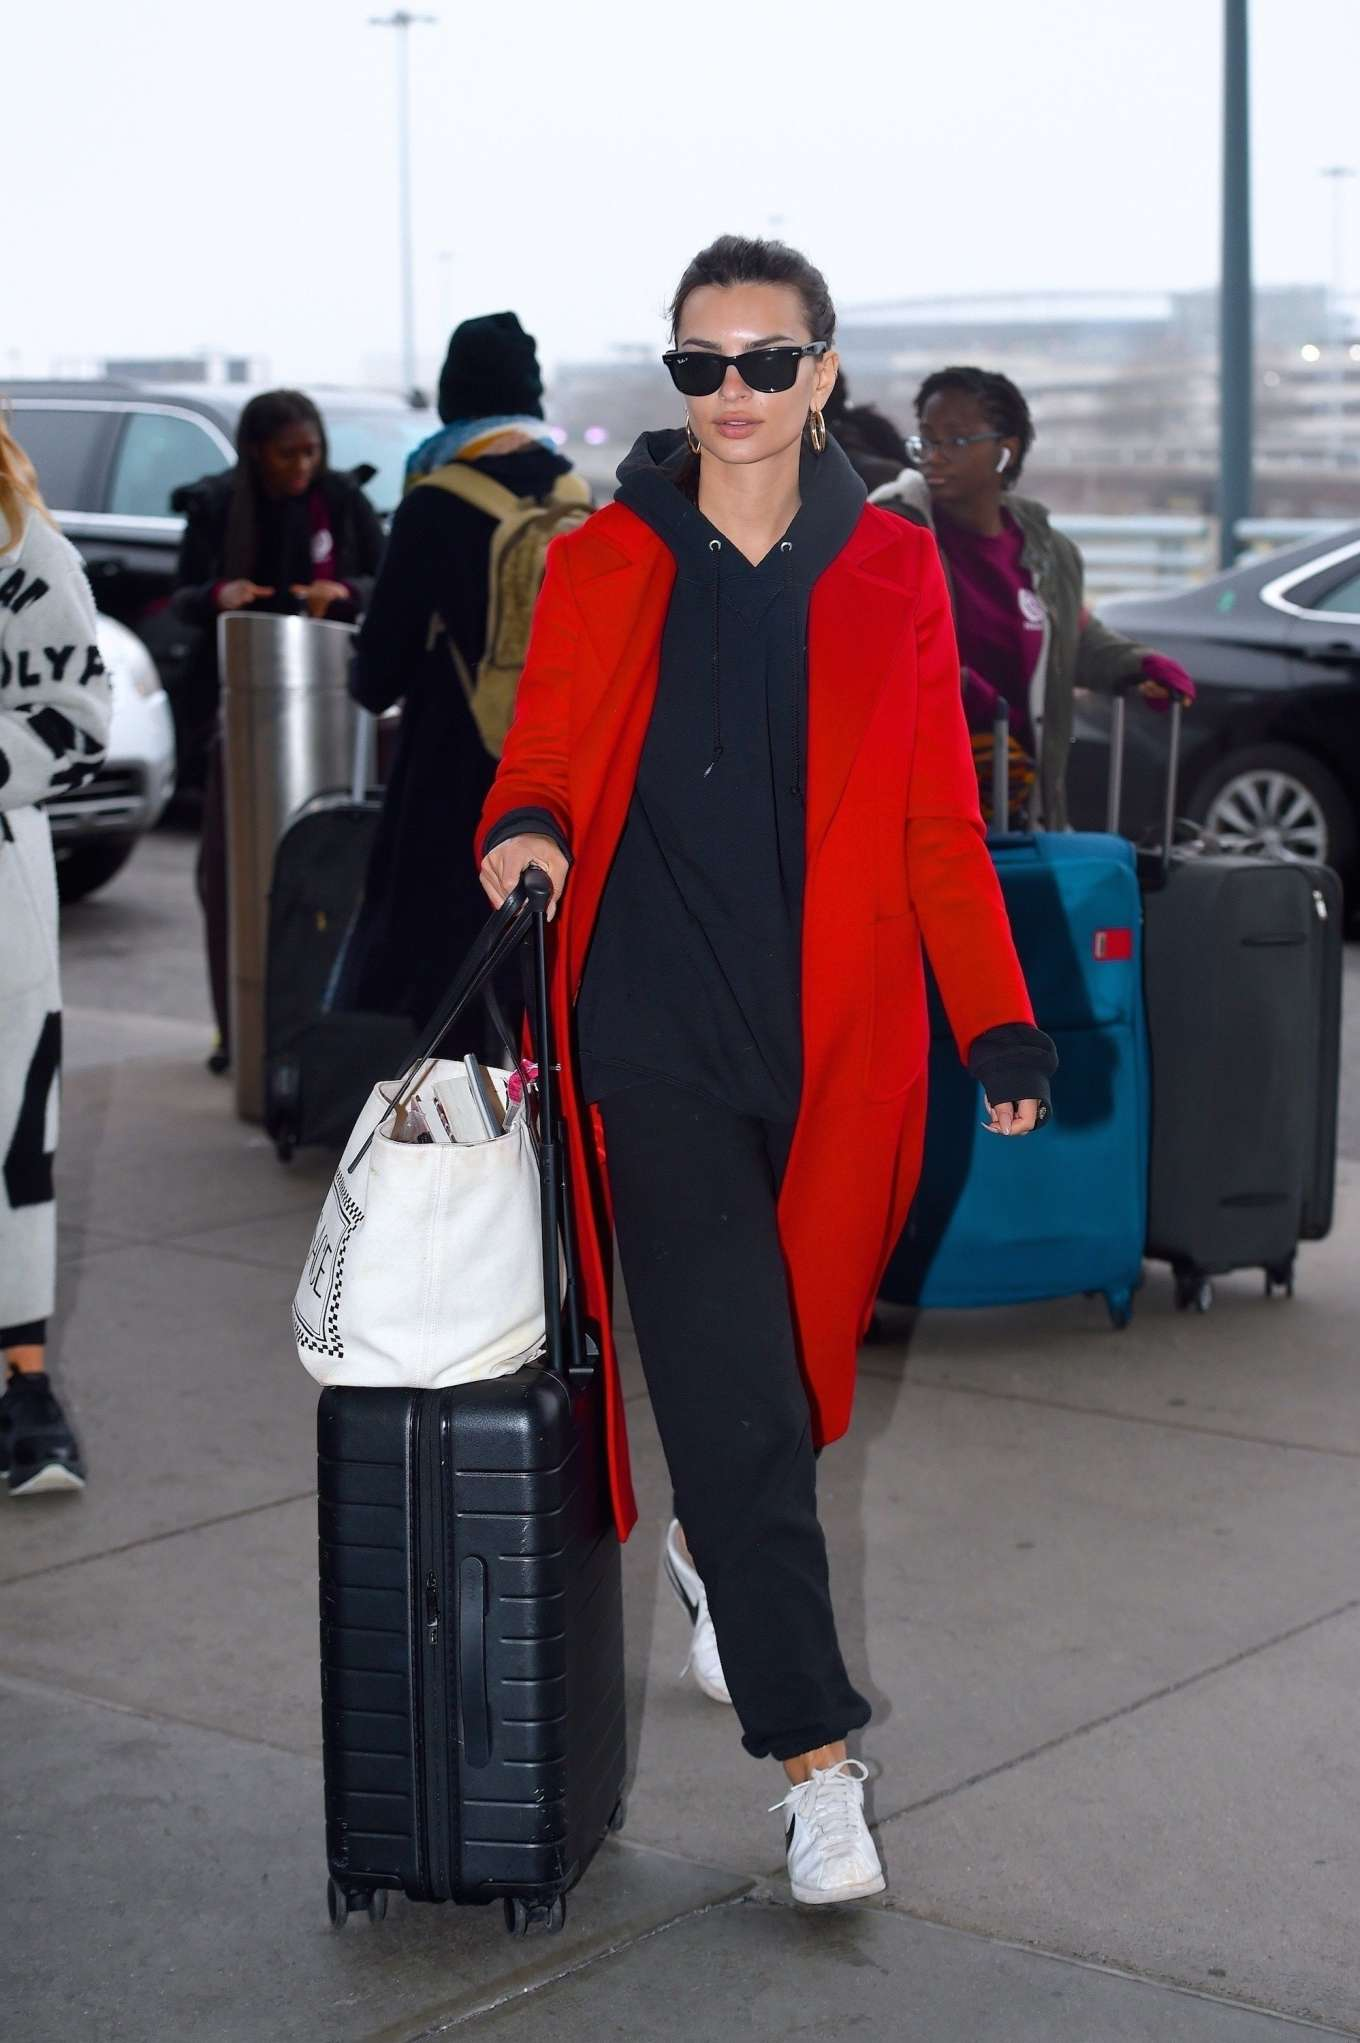 Emily Ratajkowski 2020 : Emily Ratajkowski in red coat ready for flight at JFK airport-02